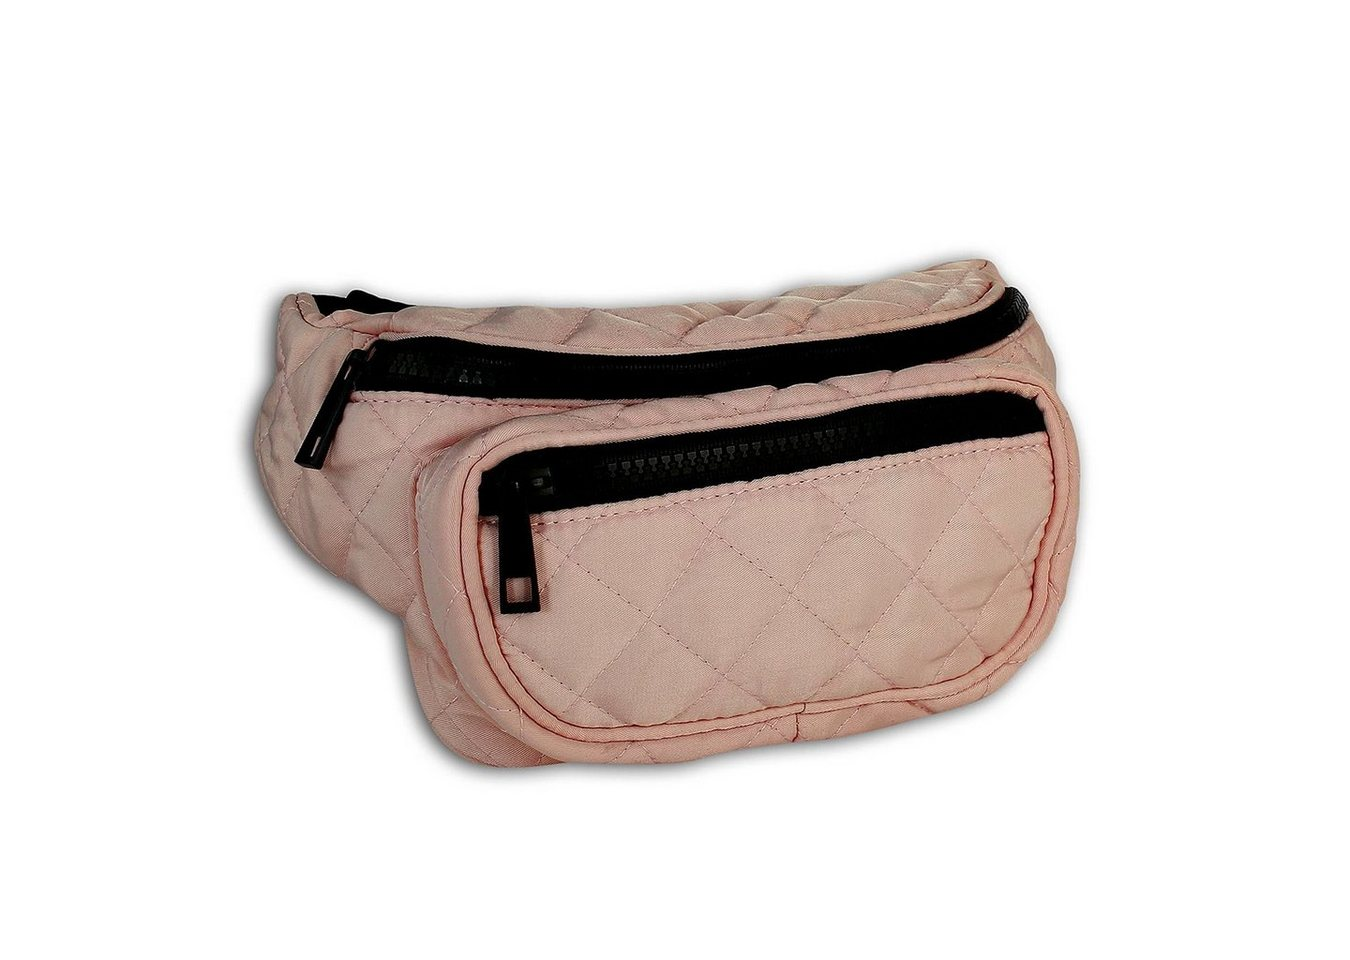 new bags -  Gürteltasche »OTD5026X  Damen Hüfttasche Gürteltasche« (Gürteltasche), Damen, Jugend Tasche rosa, ca. 24cm x ca. 10cm